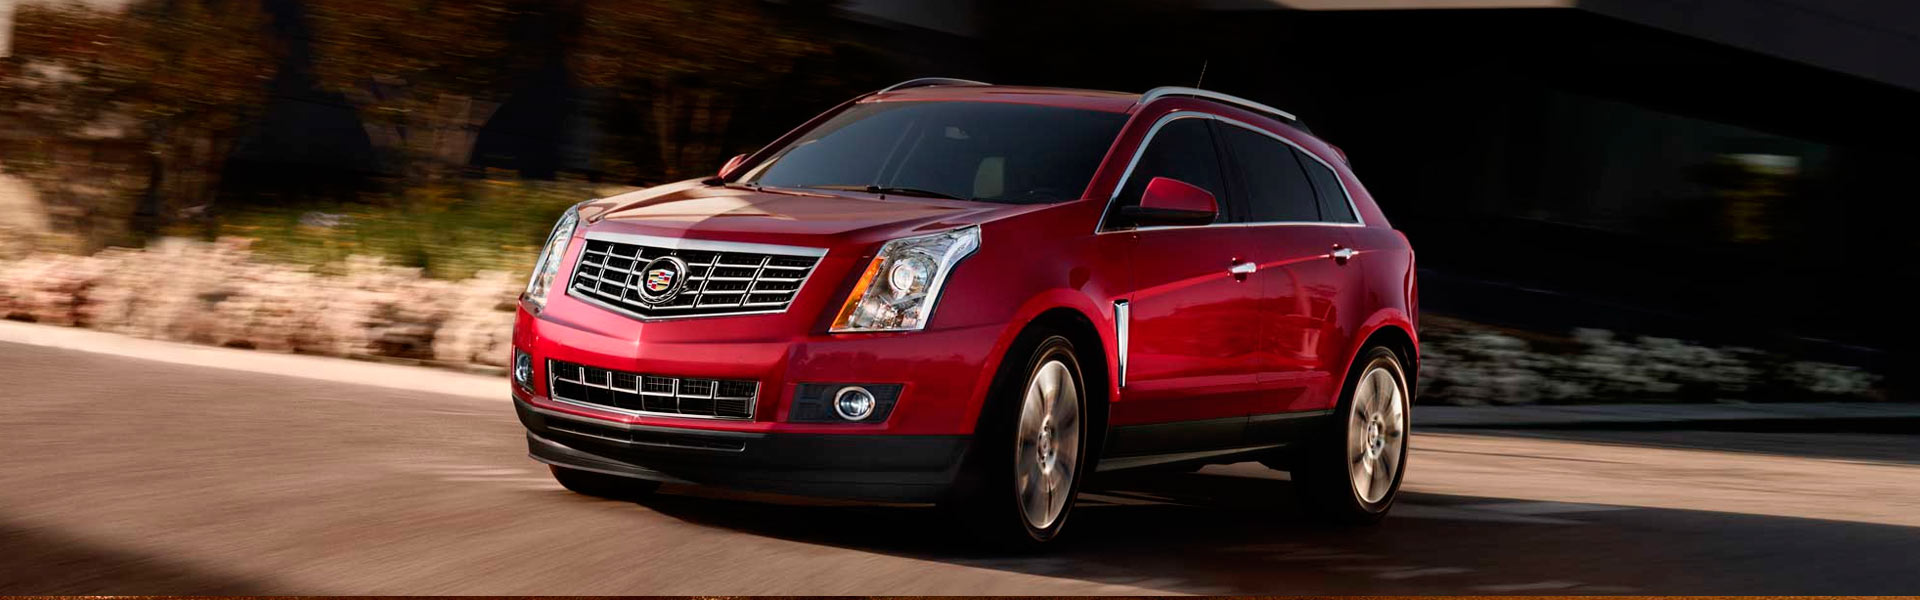 Замена цилиндров Cadillac